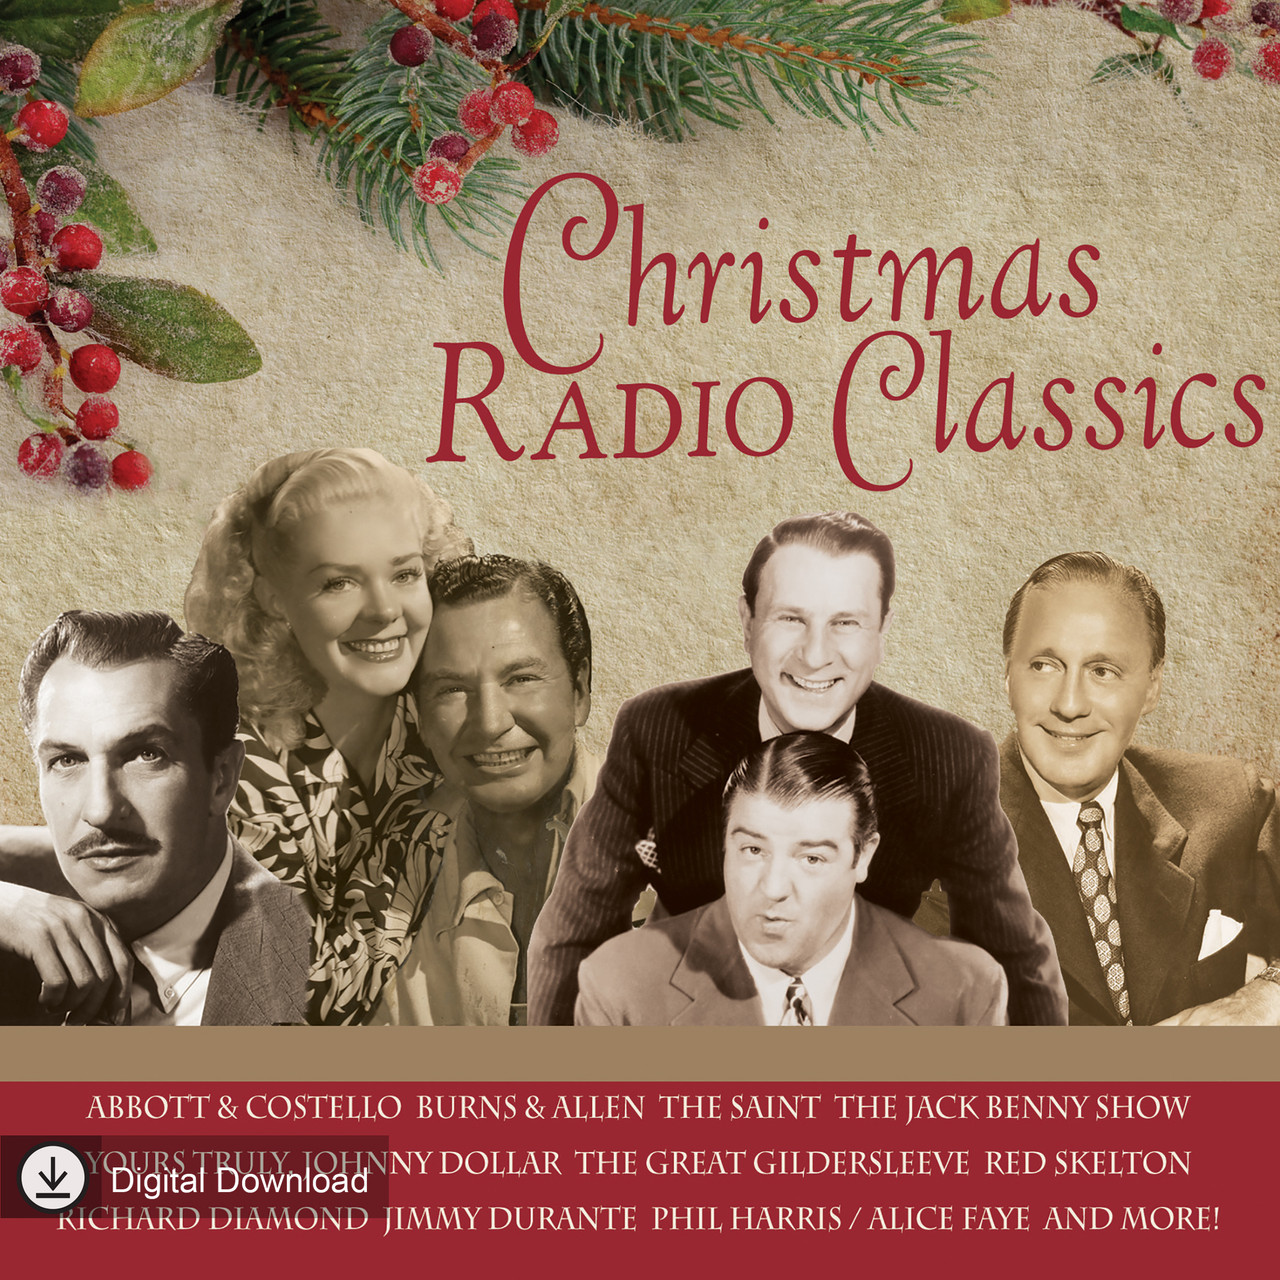 Christmas Radio Classics (MP3 Download)